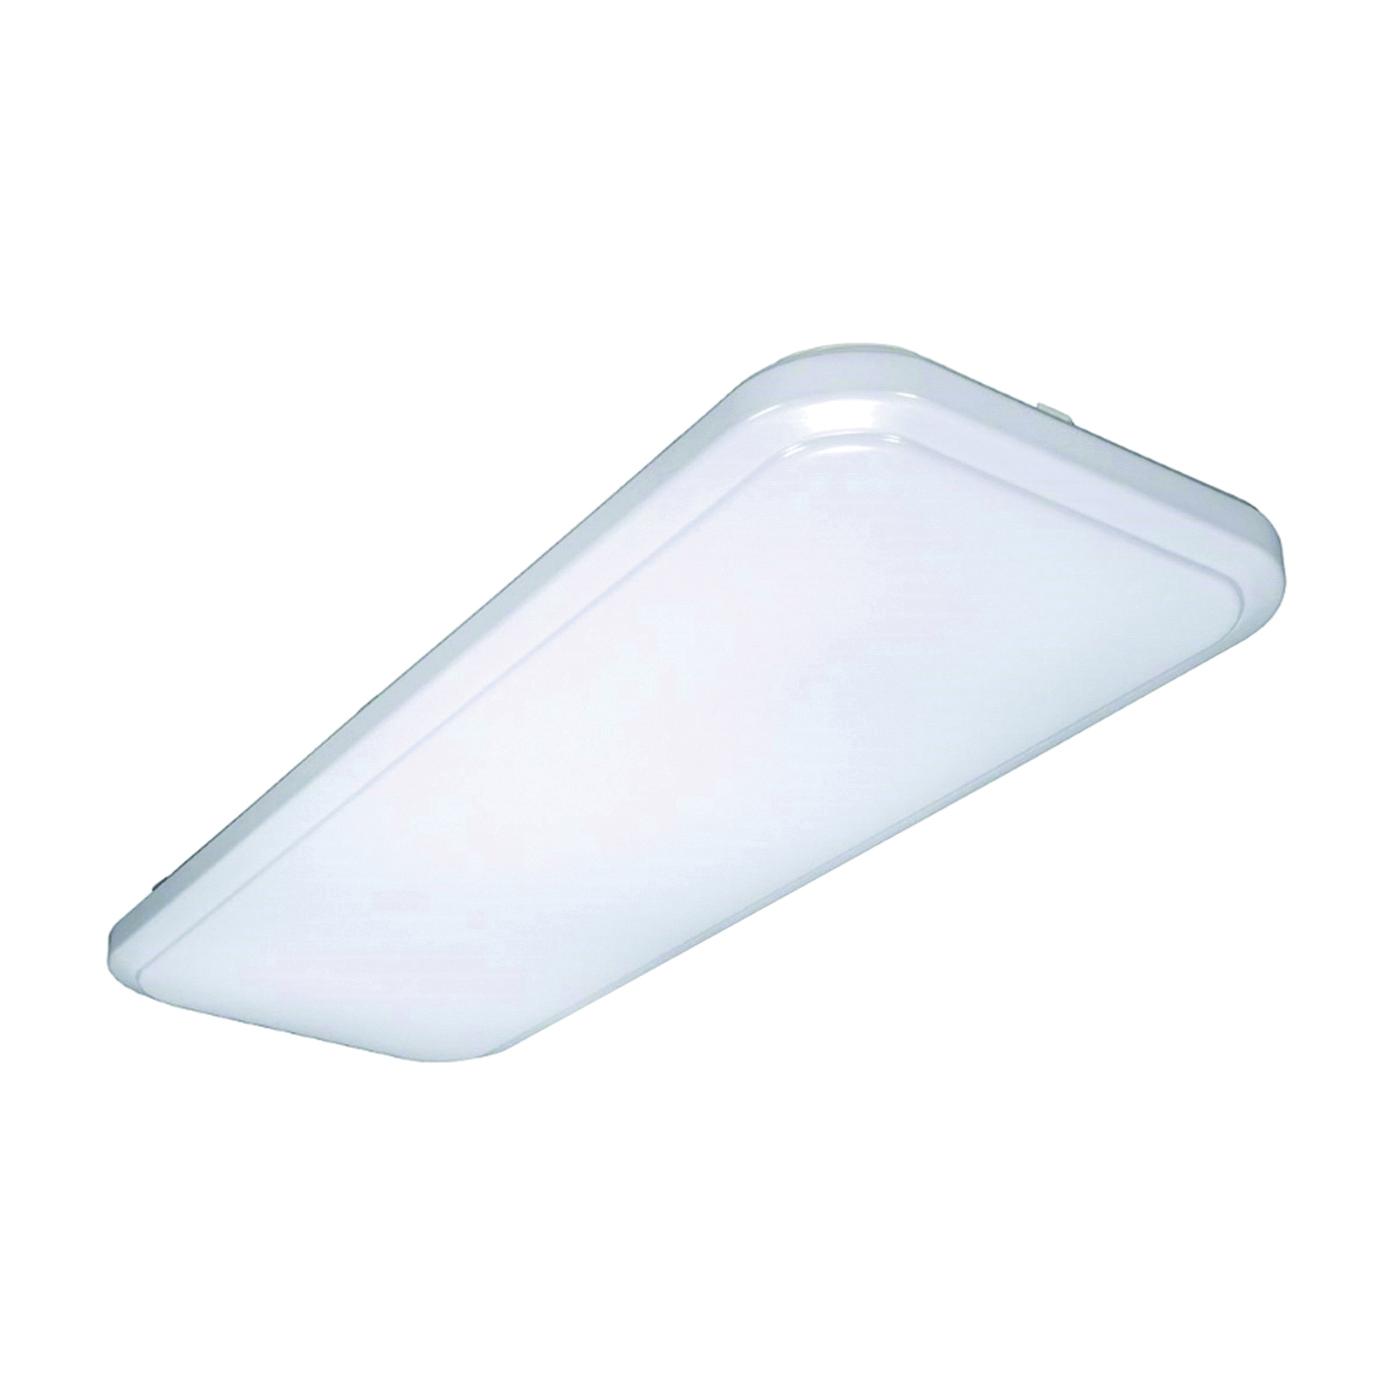 Picture of ETI 54649142 Ceiling Light, 120 VAC, 75 W, LED Lamp, 5500 Lumens, 4000 K Color Temp